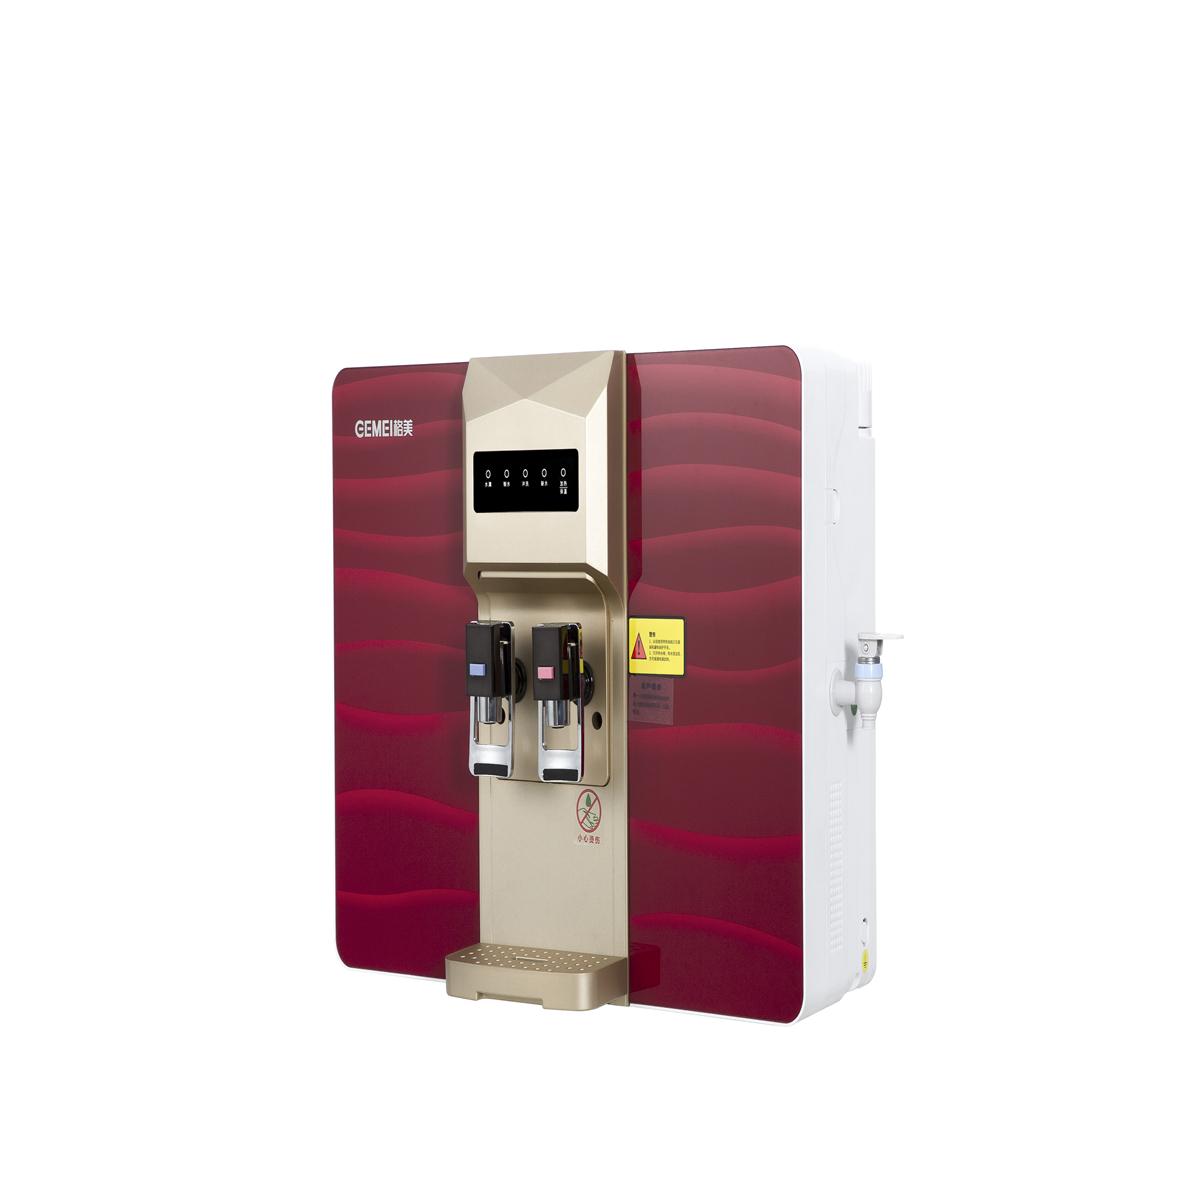 RO filter straight drinking hot,warm,cold water dispenser TN-RO-122